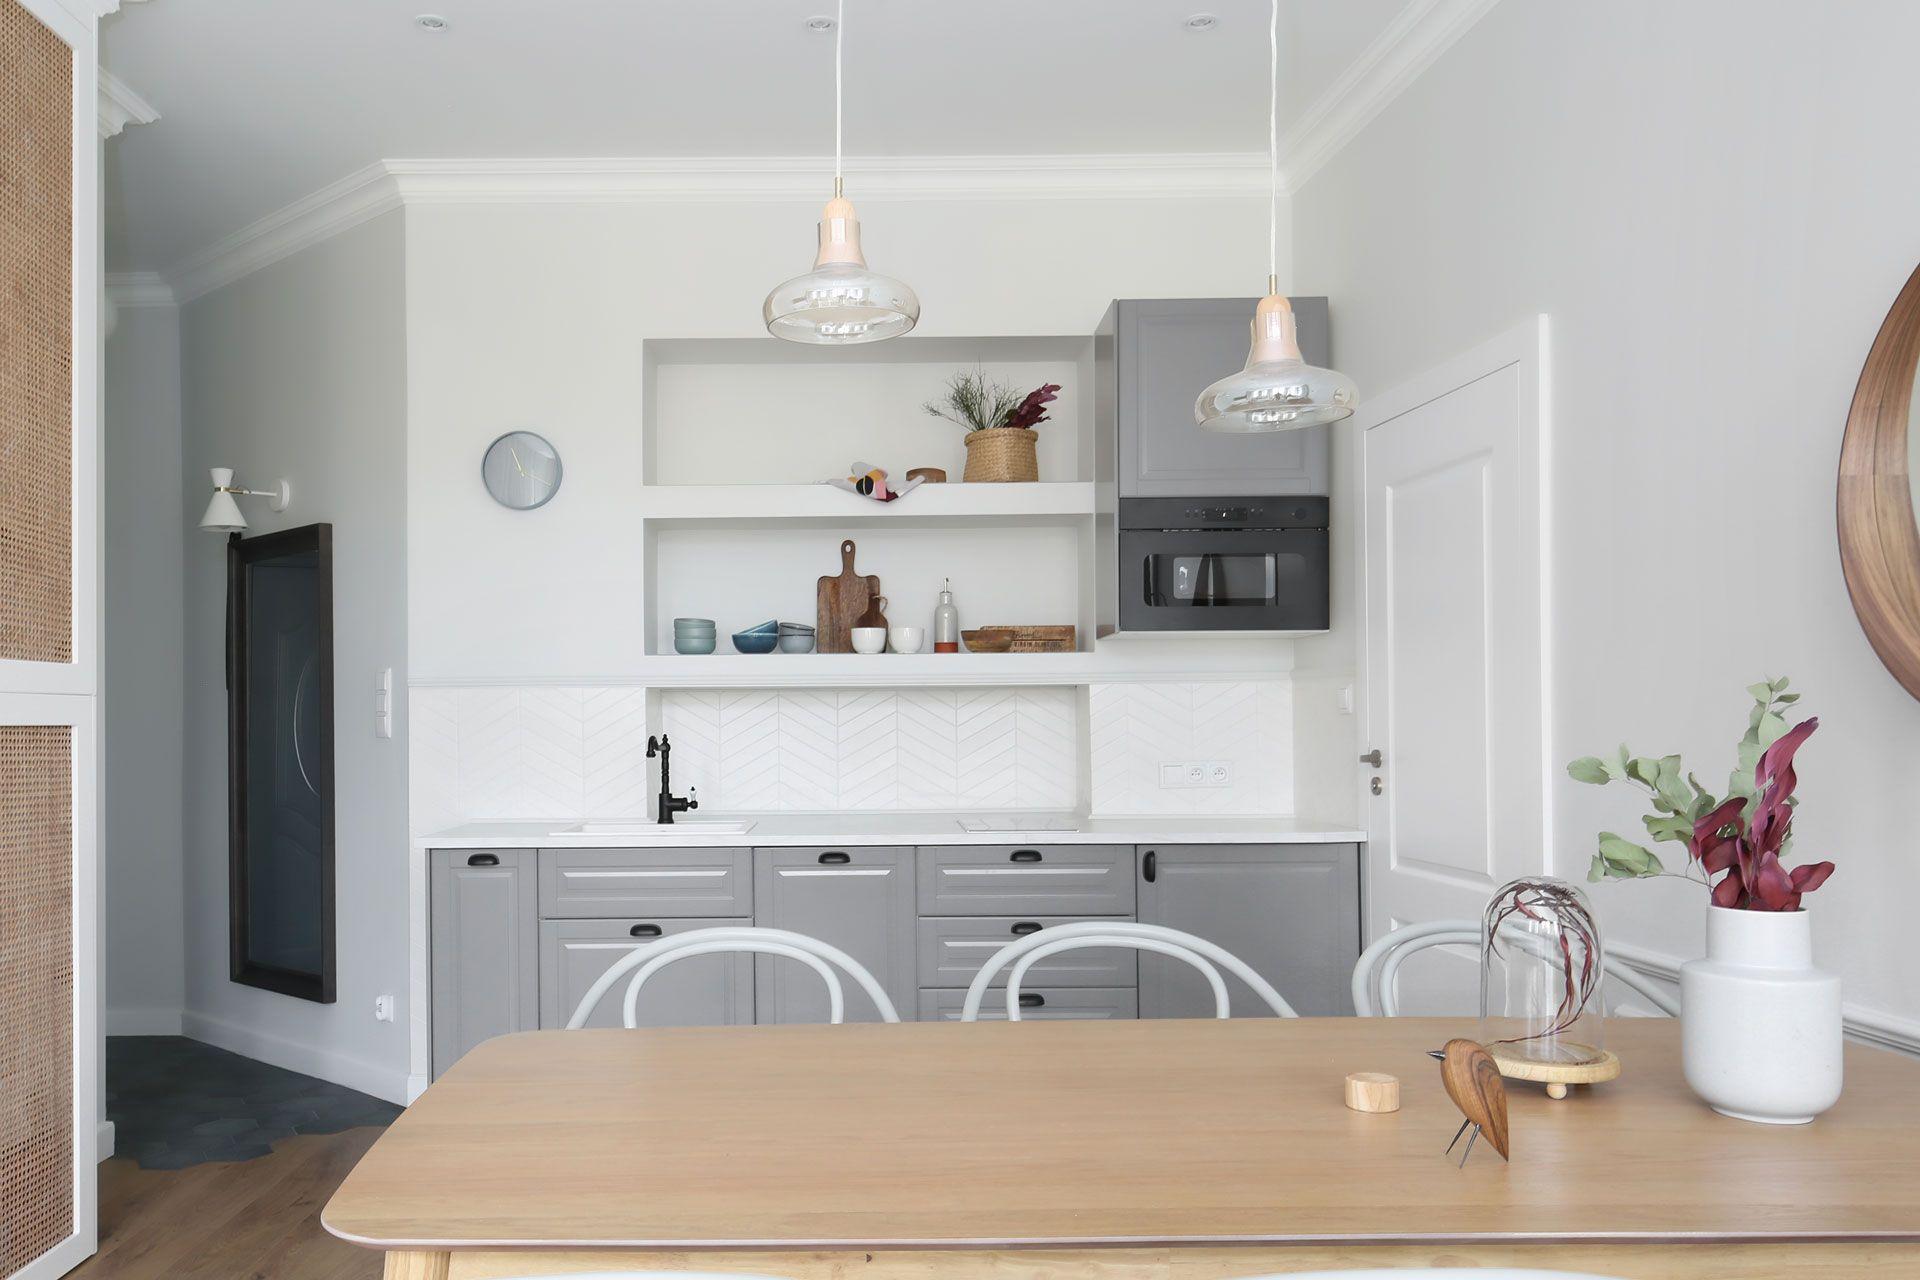 Foorni Pl Projekt Nor Studio Bialo Szara Kuchnia I Jadalnia W Sopockim Apartamencie Kuchnia Jadalnia Sopot Wnetrze Projekt D Home Decor Home House